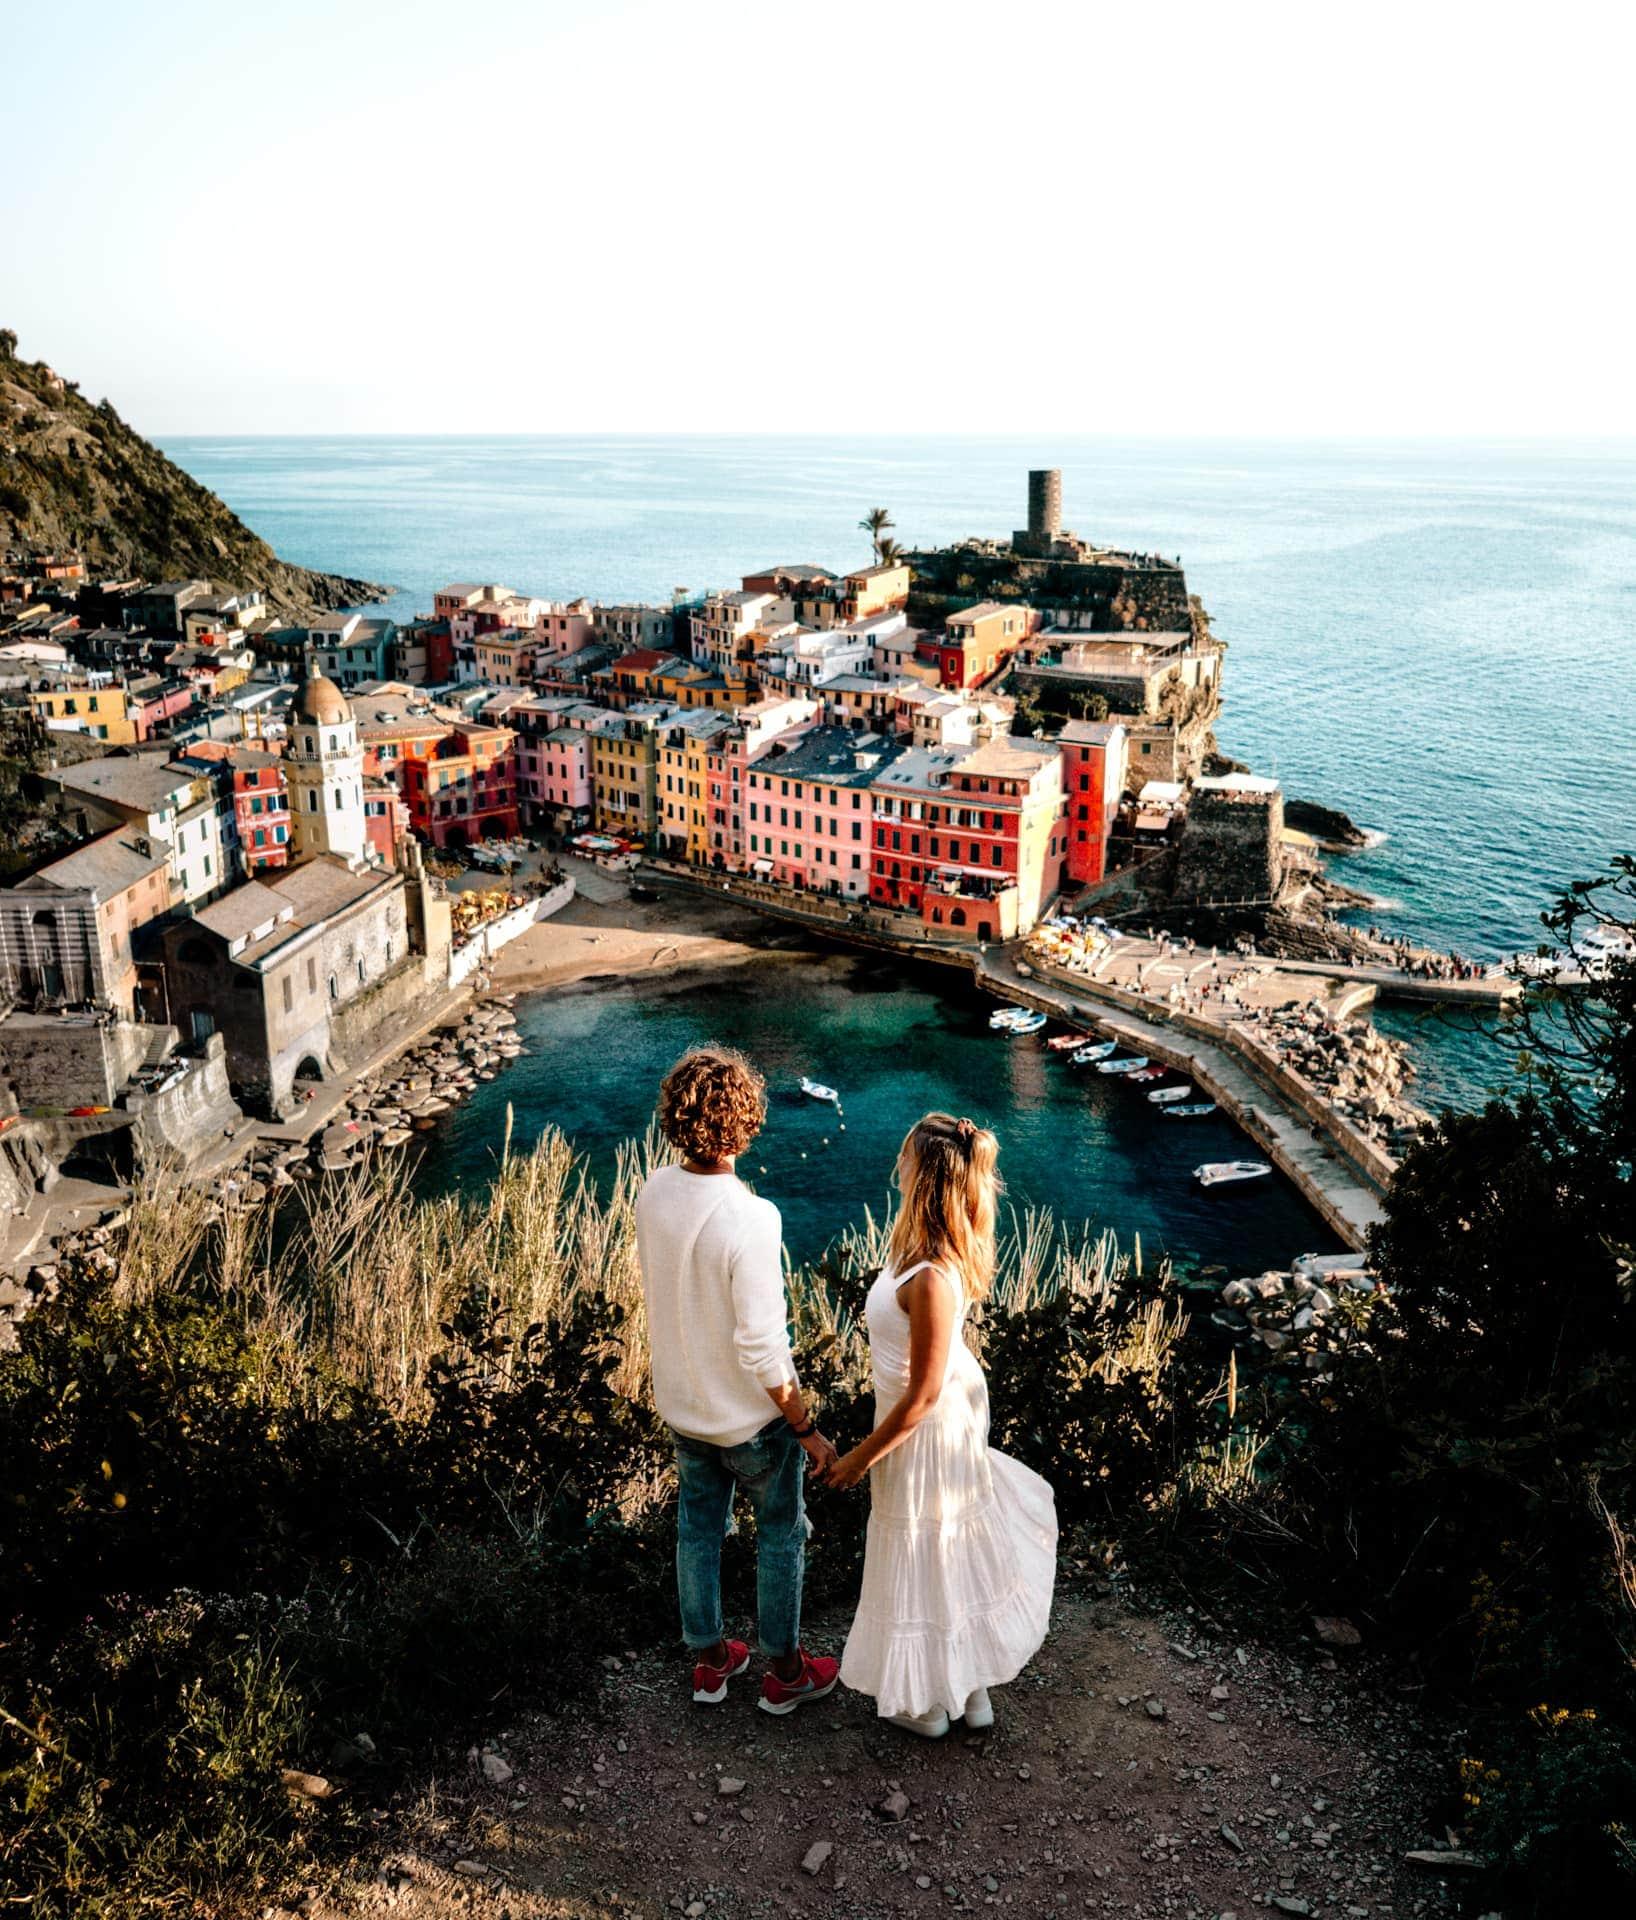 Vernazza Cinque Terre italy viewpoint